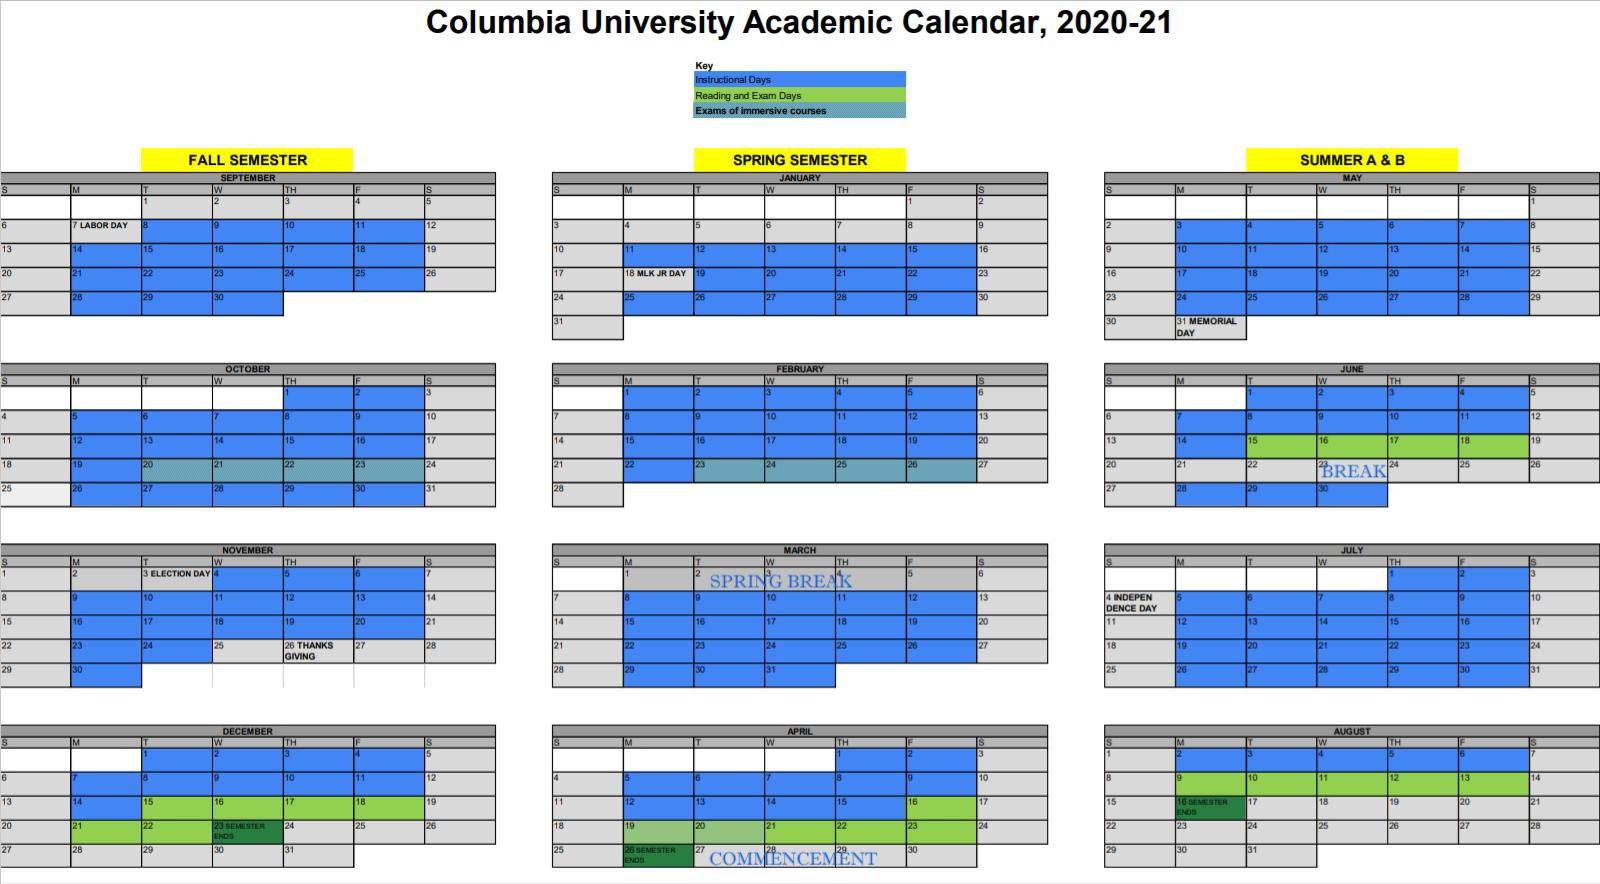 Columbia University Calendar 2020-2021